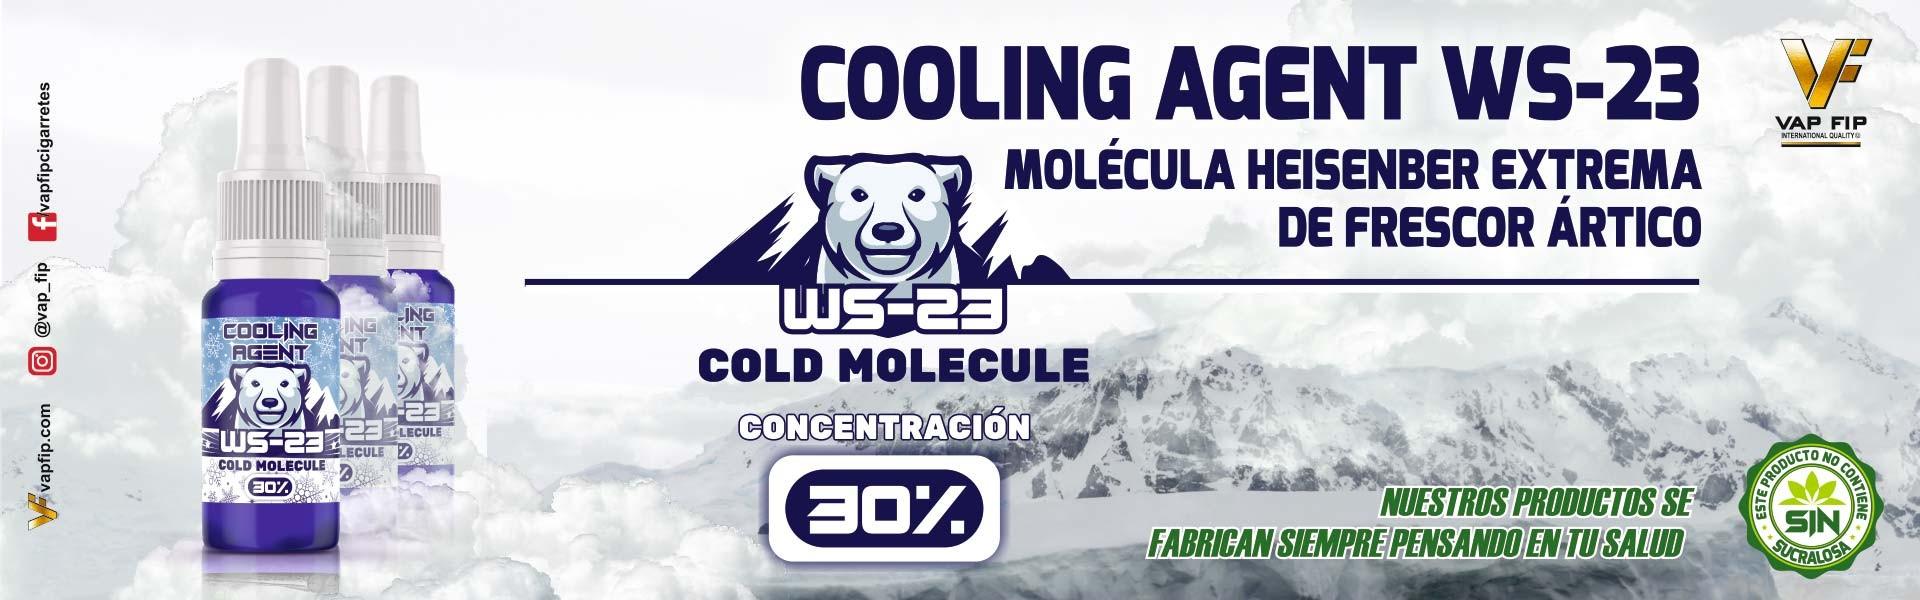 COOLING AGENT WS-23 ( MOLÉCULA DE FRESCOR)